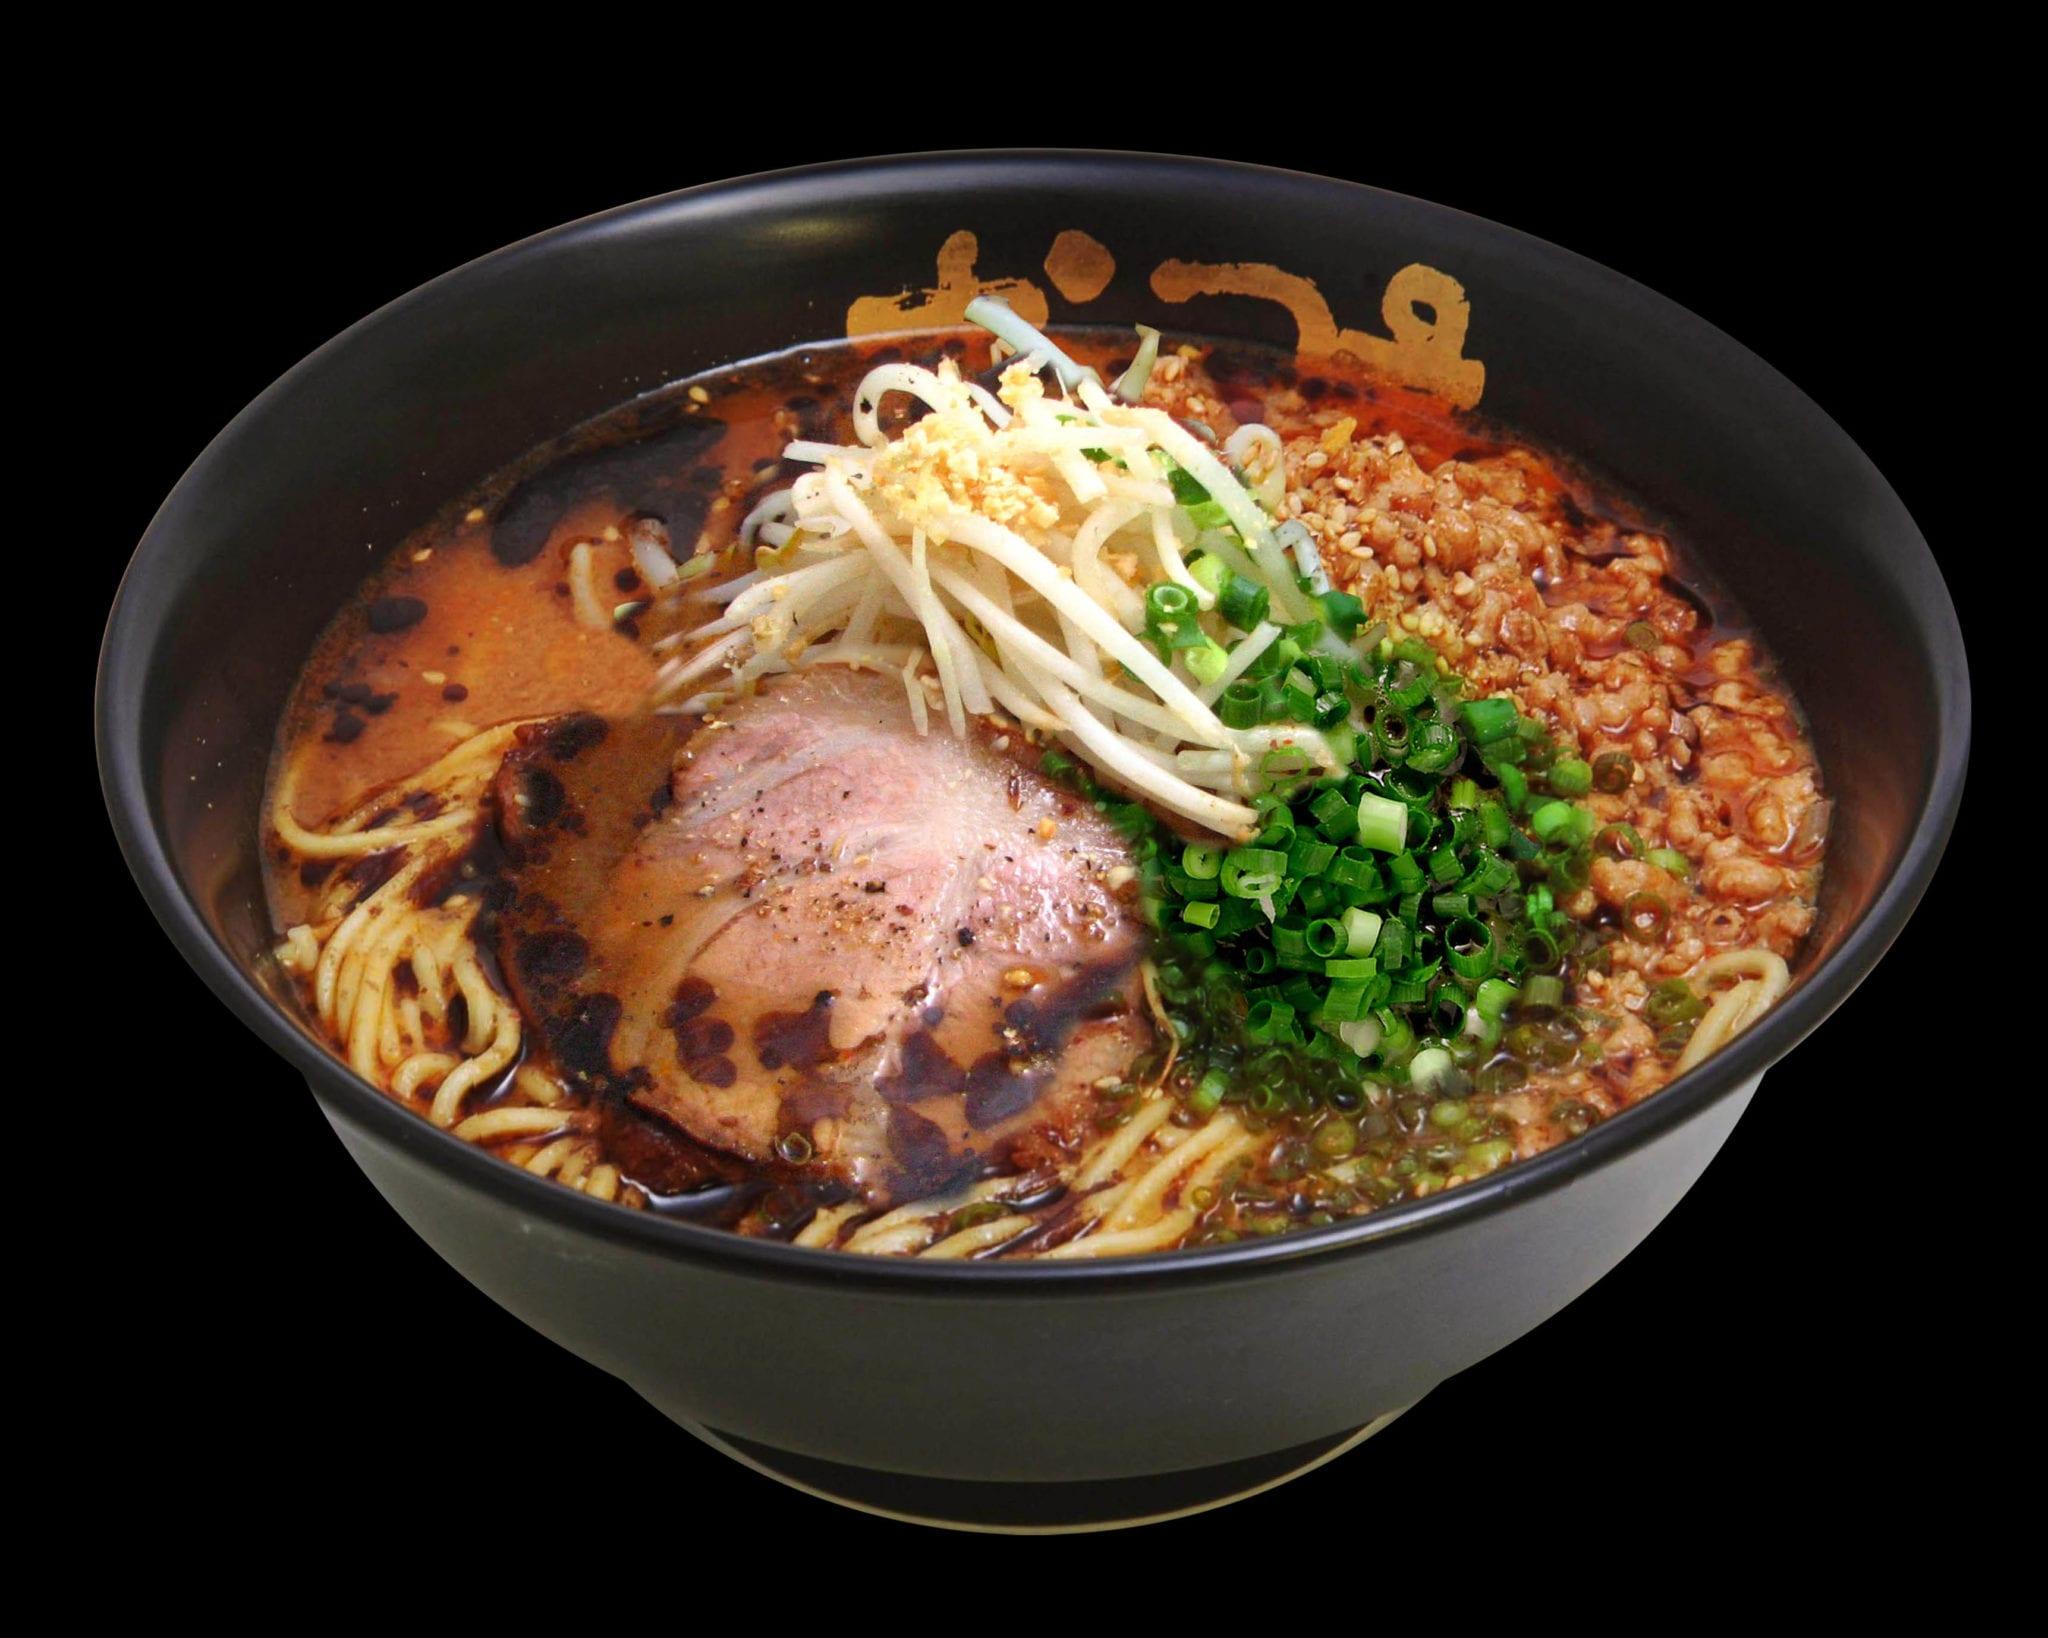 spicy miso ramen with pork slices